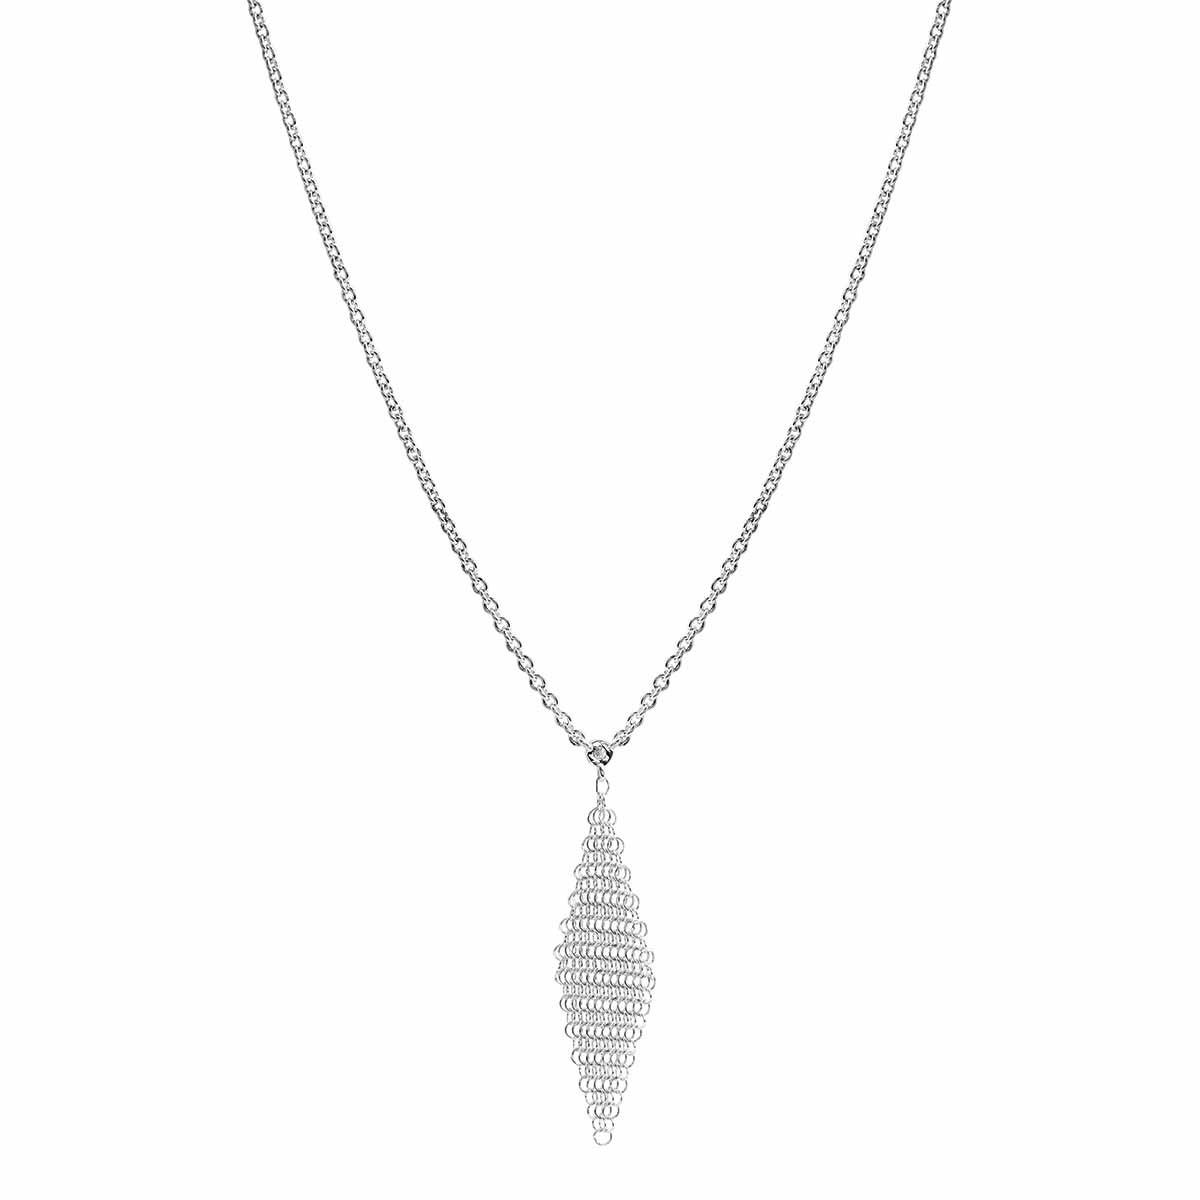 Vintage Tiffany & Co. Elsa Peretti 0.05 CT Diamond Mesh Necklace